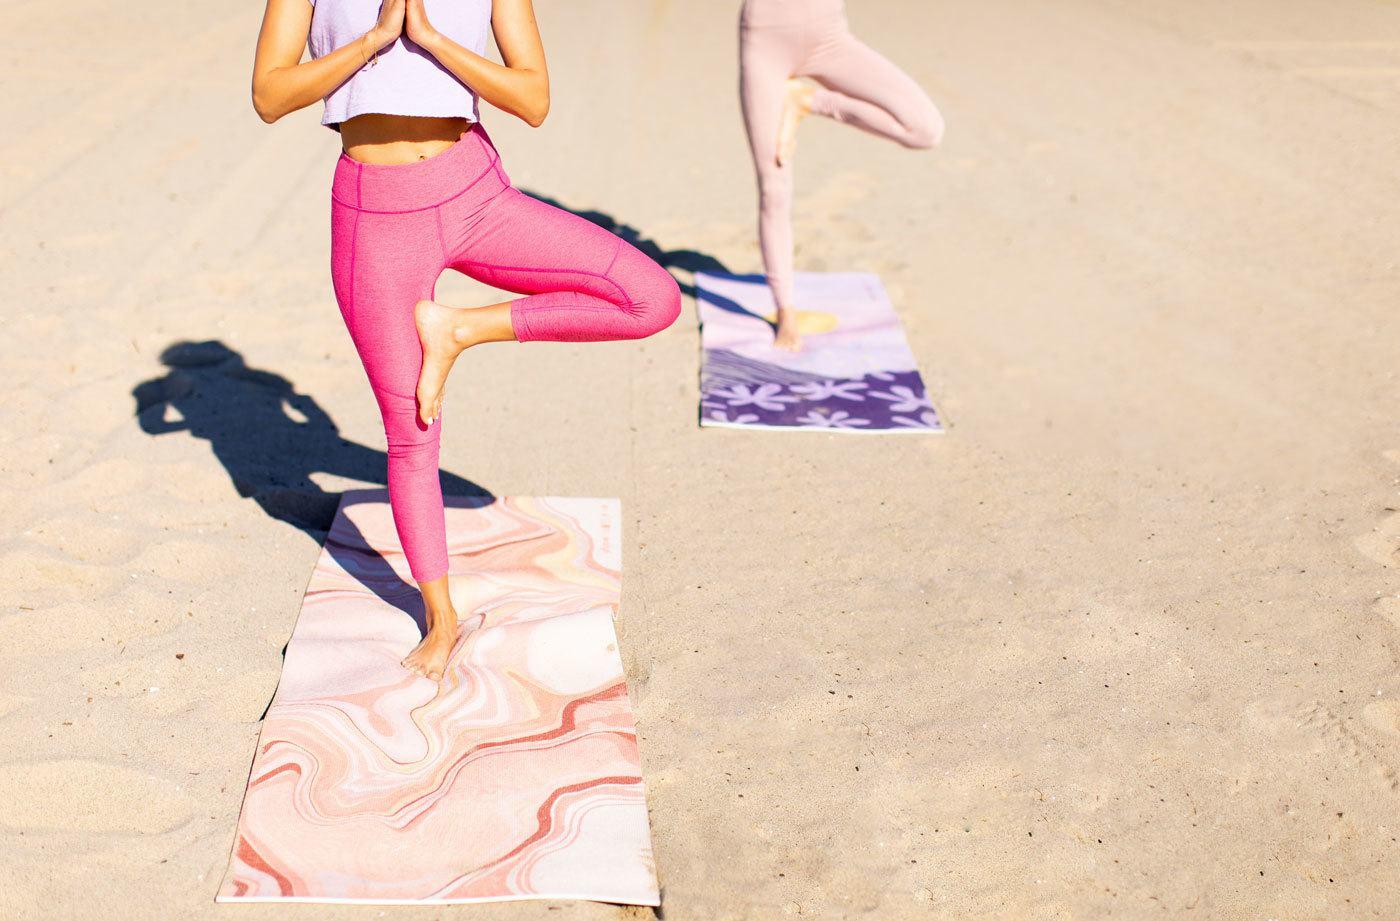 910b1cfa9cc86 Raise your vibe with this rose quartz-inspired yoga mat | Well+Good |  Bloglovin'